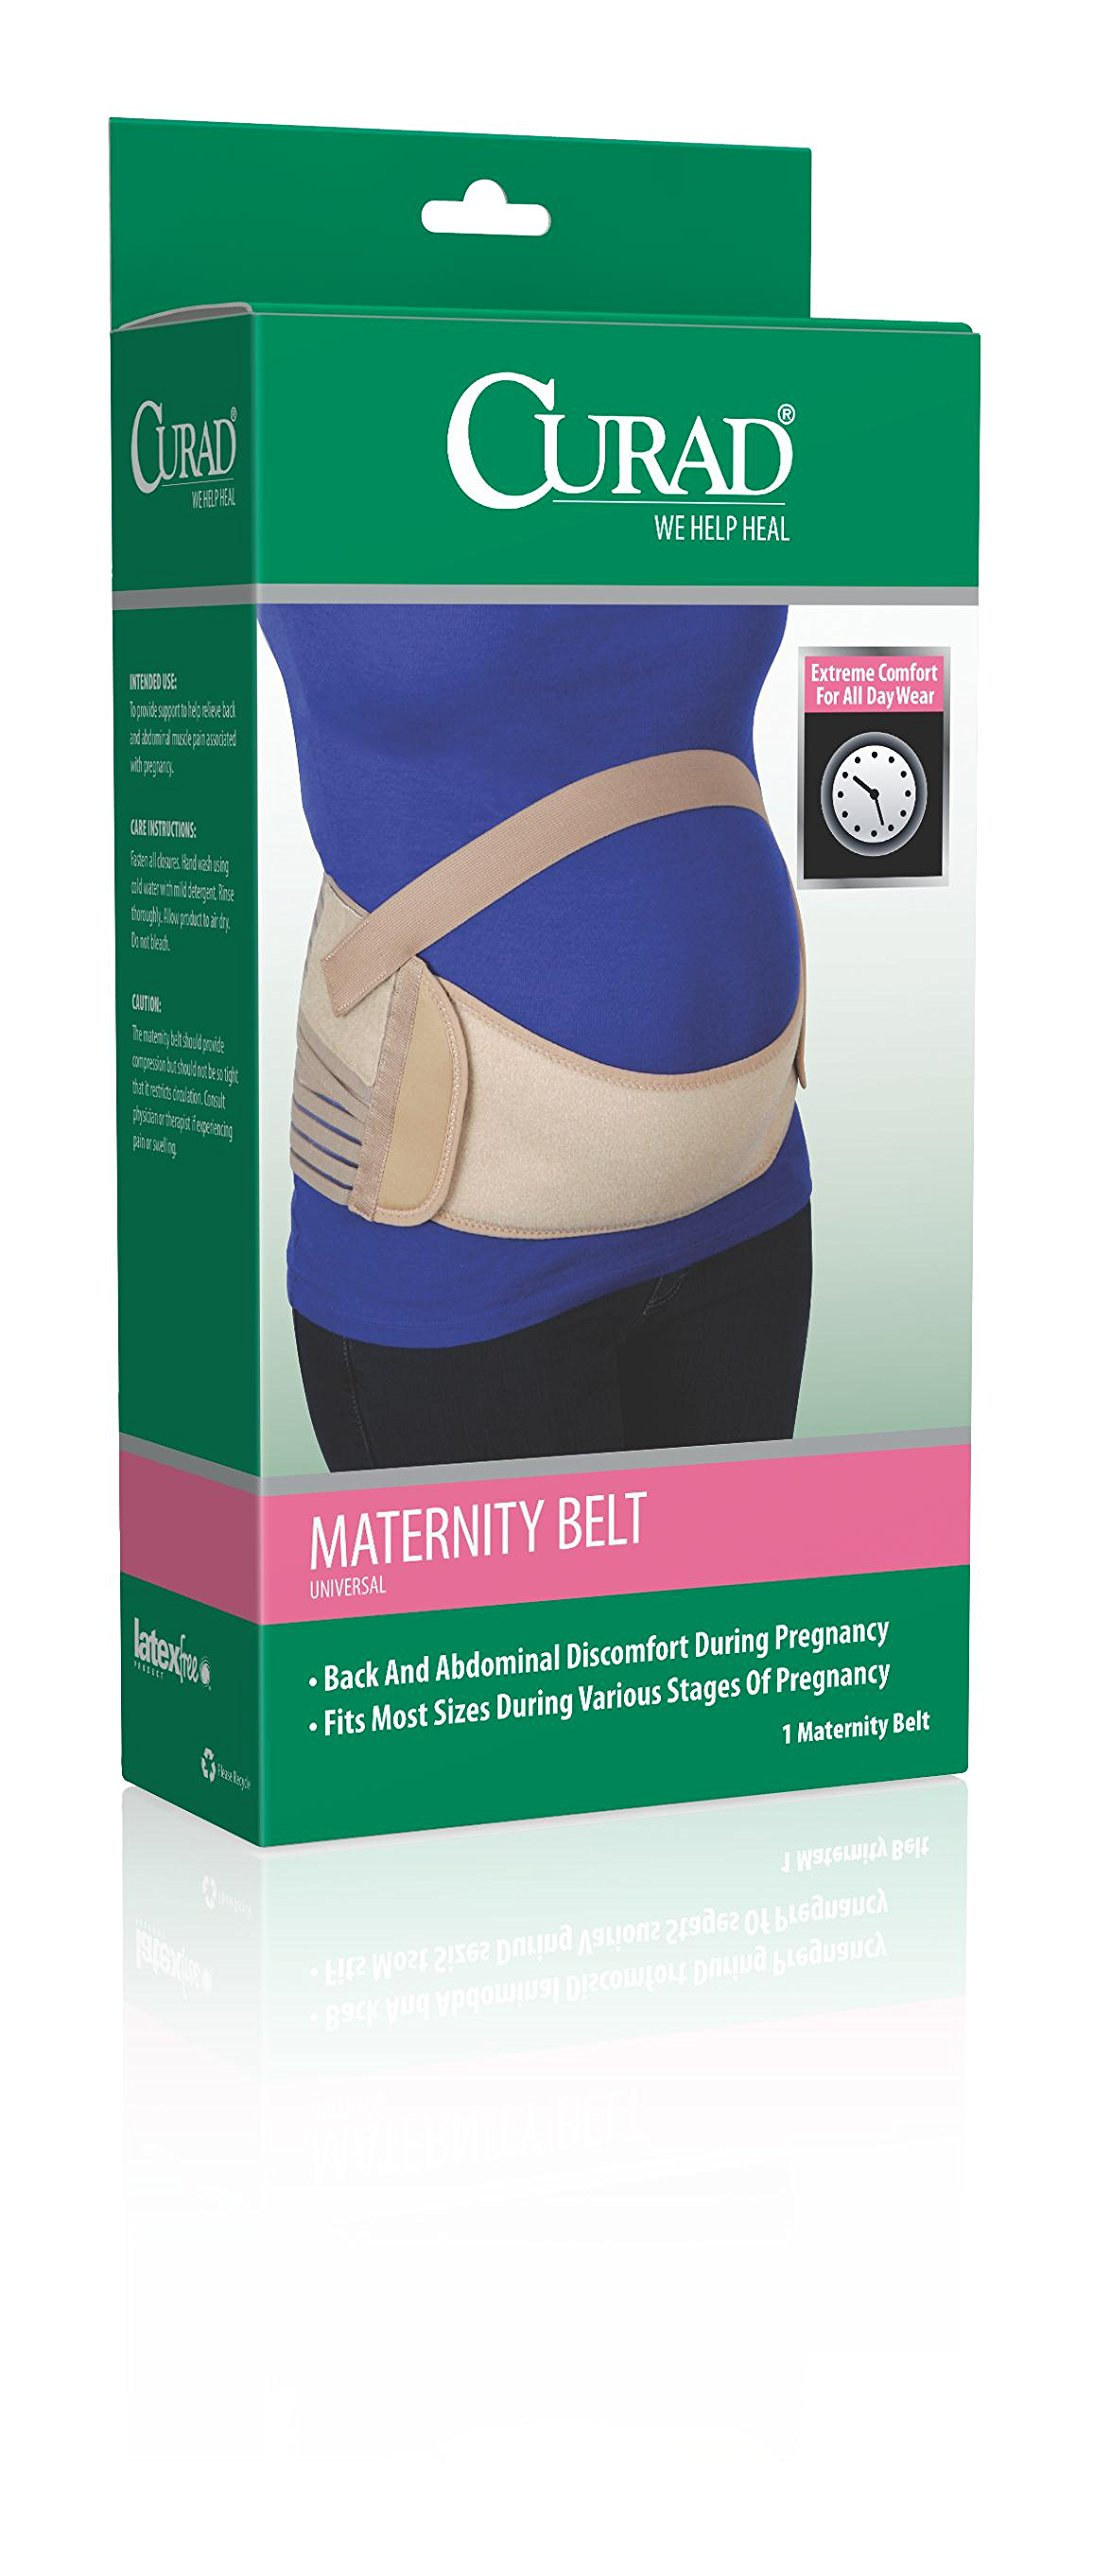 Curad Medium Maternity Belt (sizes 4 to 14) by Medline